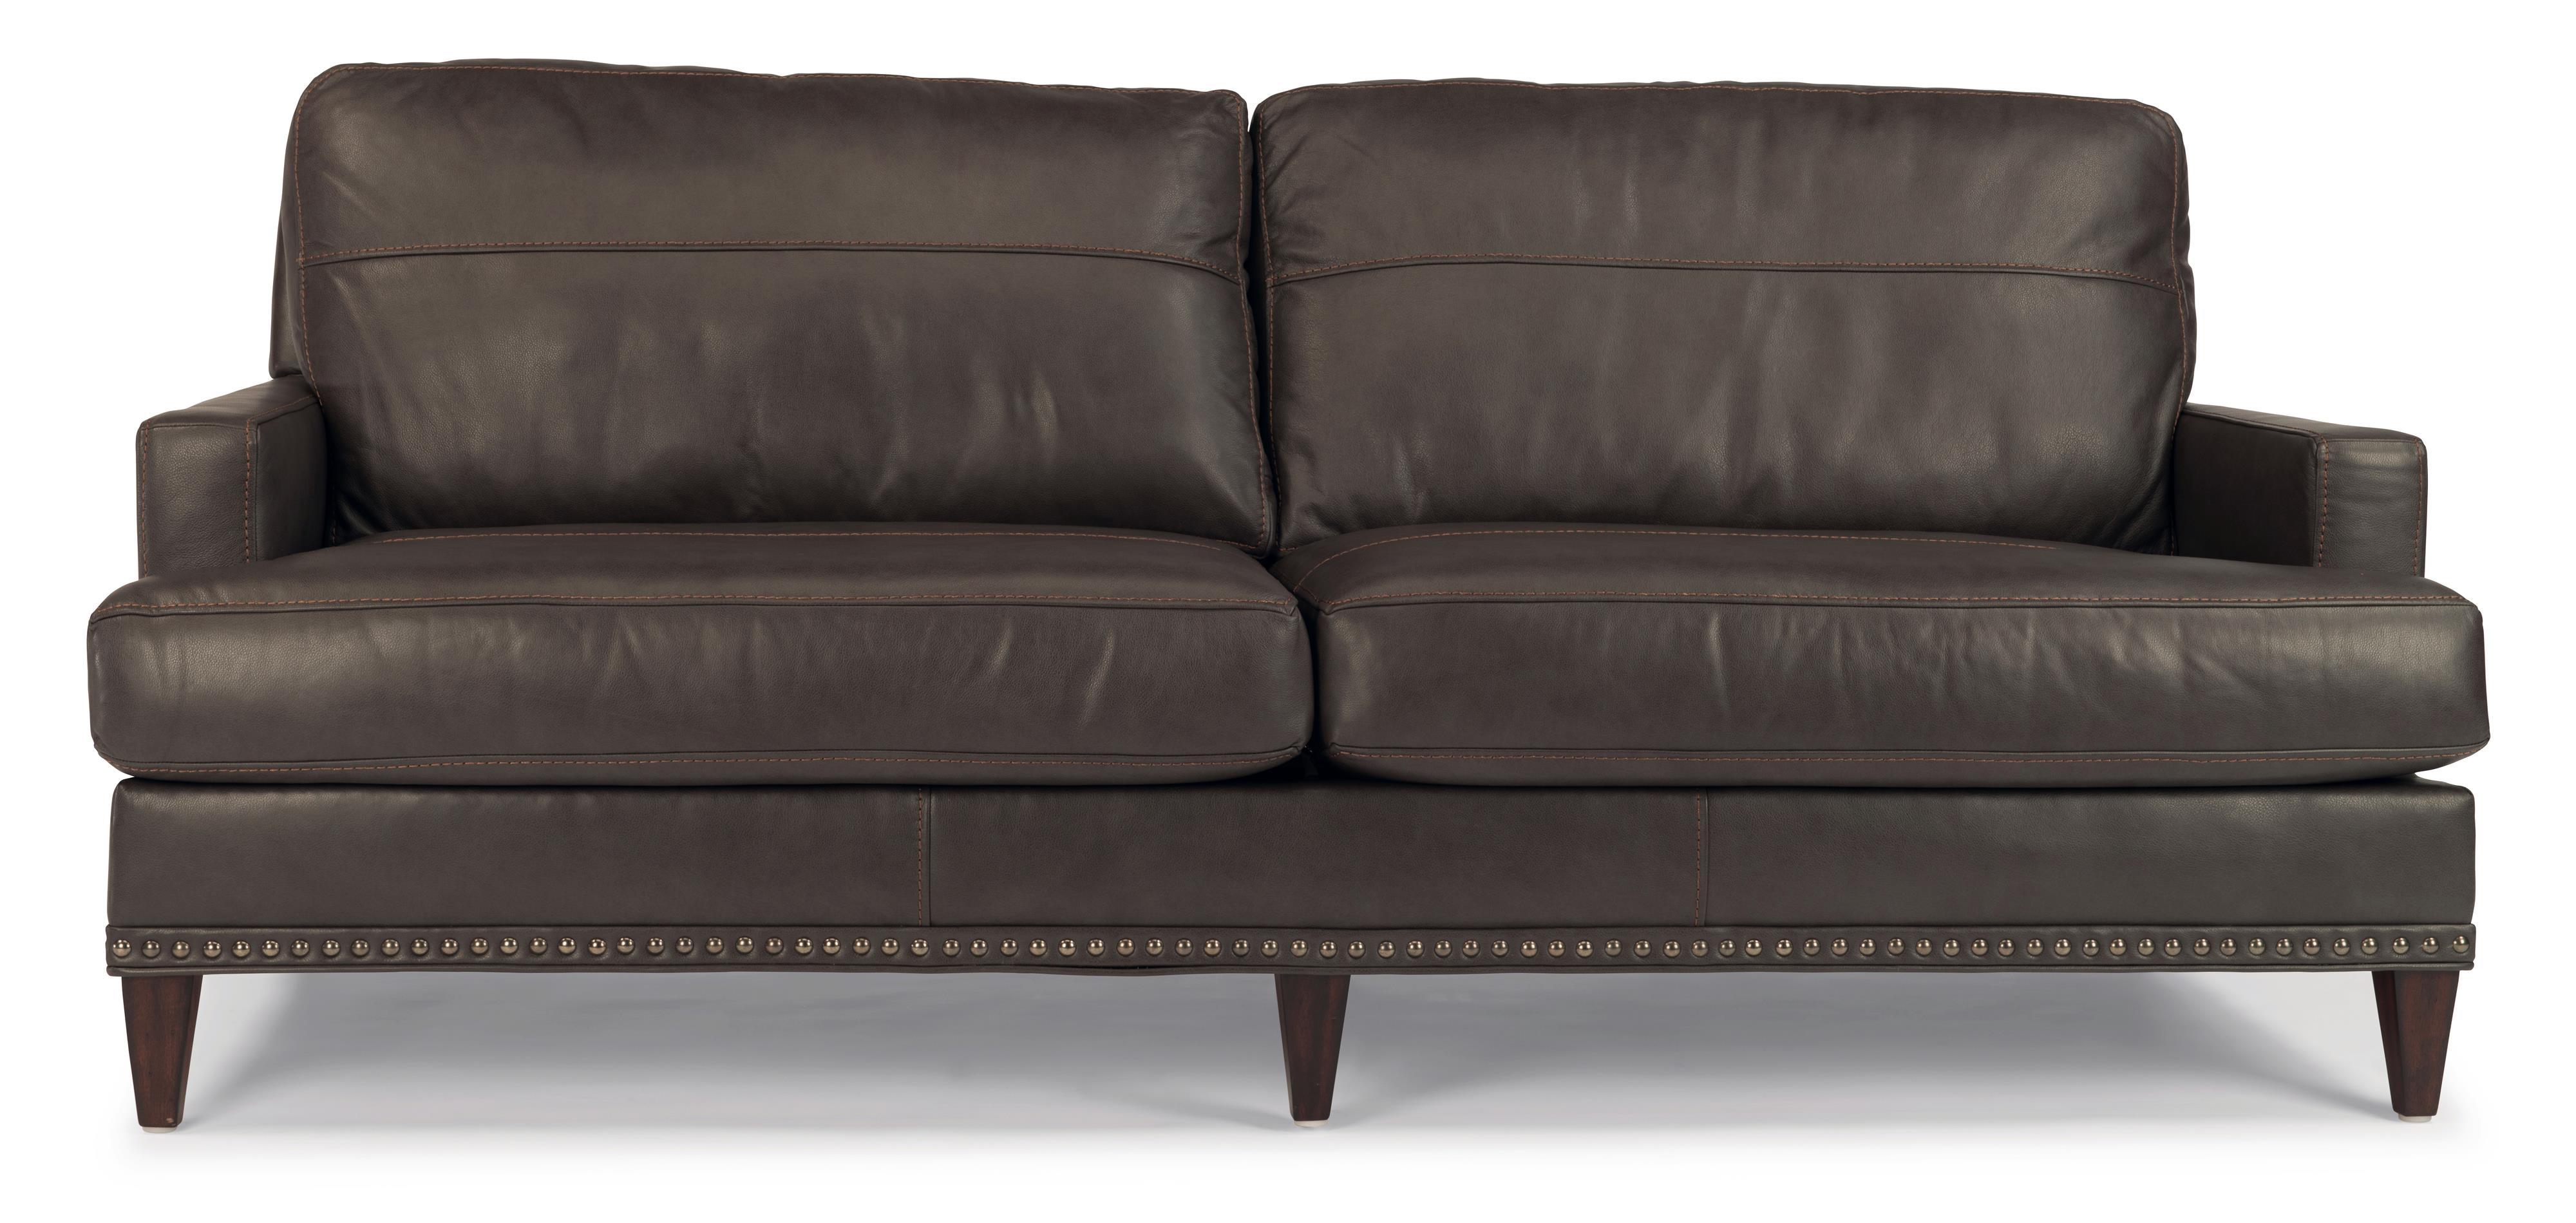 Flexsteel Ocean Sofa w/ Nails - Item Number: B3367-31-174-02